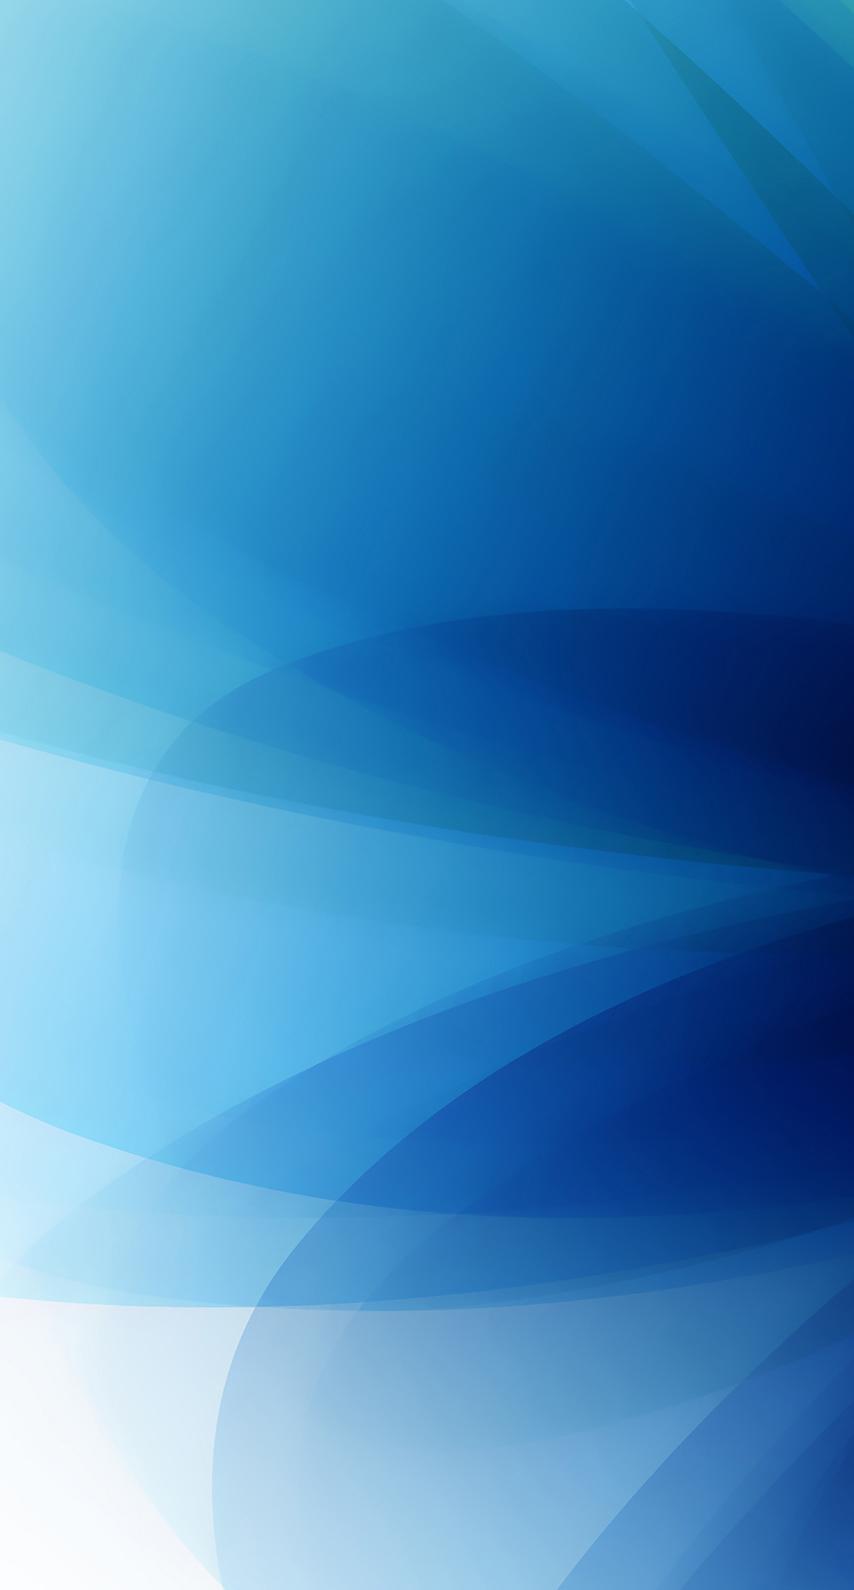 illustration, blur, graphic design, shining, color, curve, contemporary